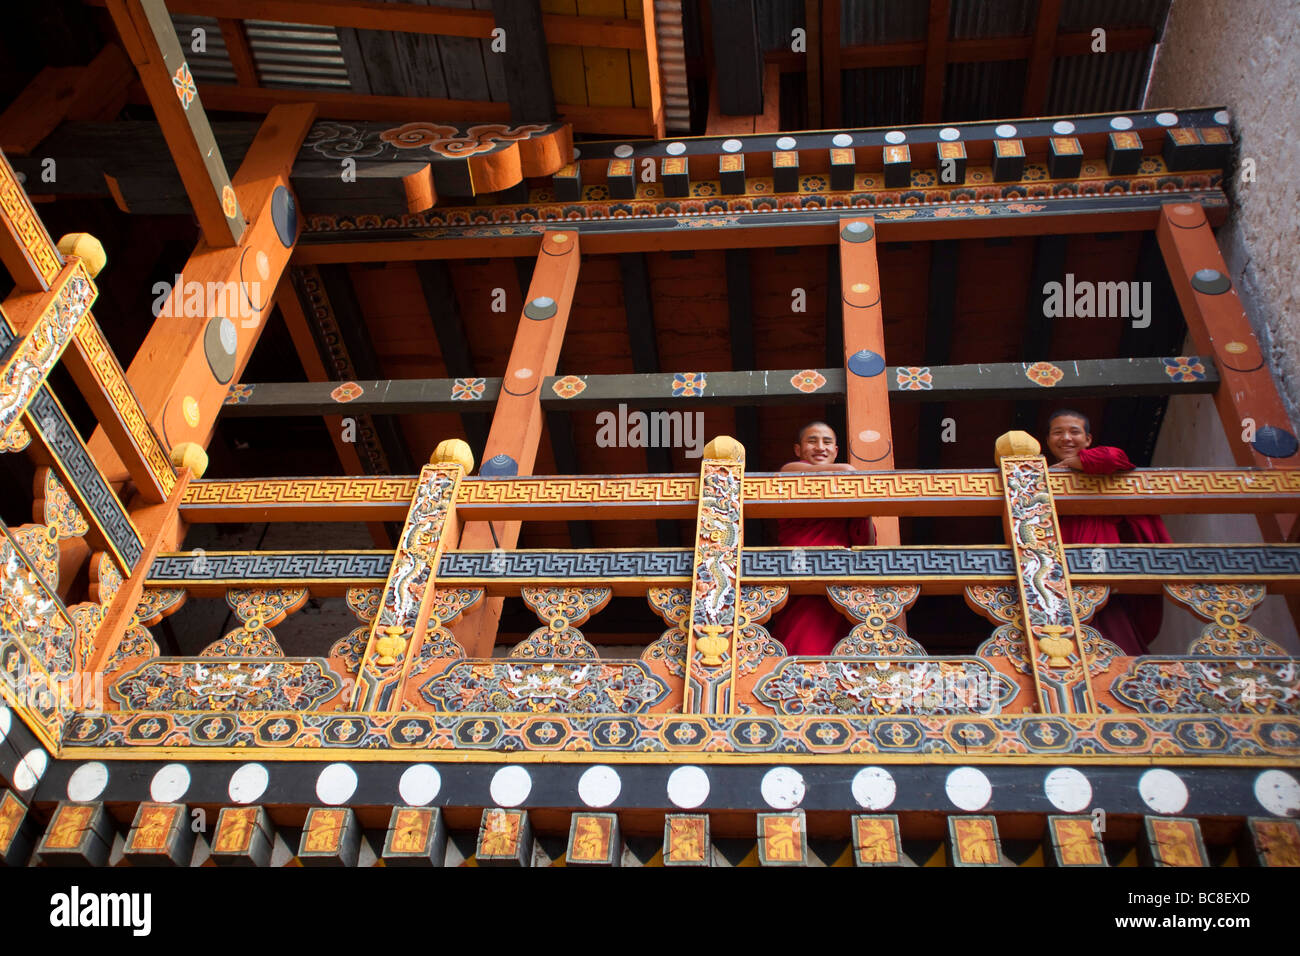 2 Monks looking out from balcony at Punakha Dzong monastery . Horizontal91625_Bhutan-Punakha - Stock Image